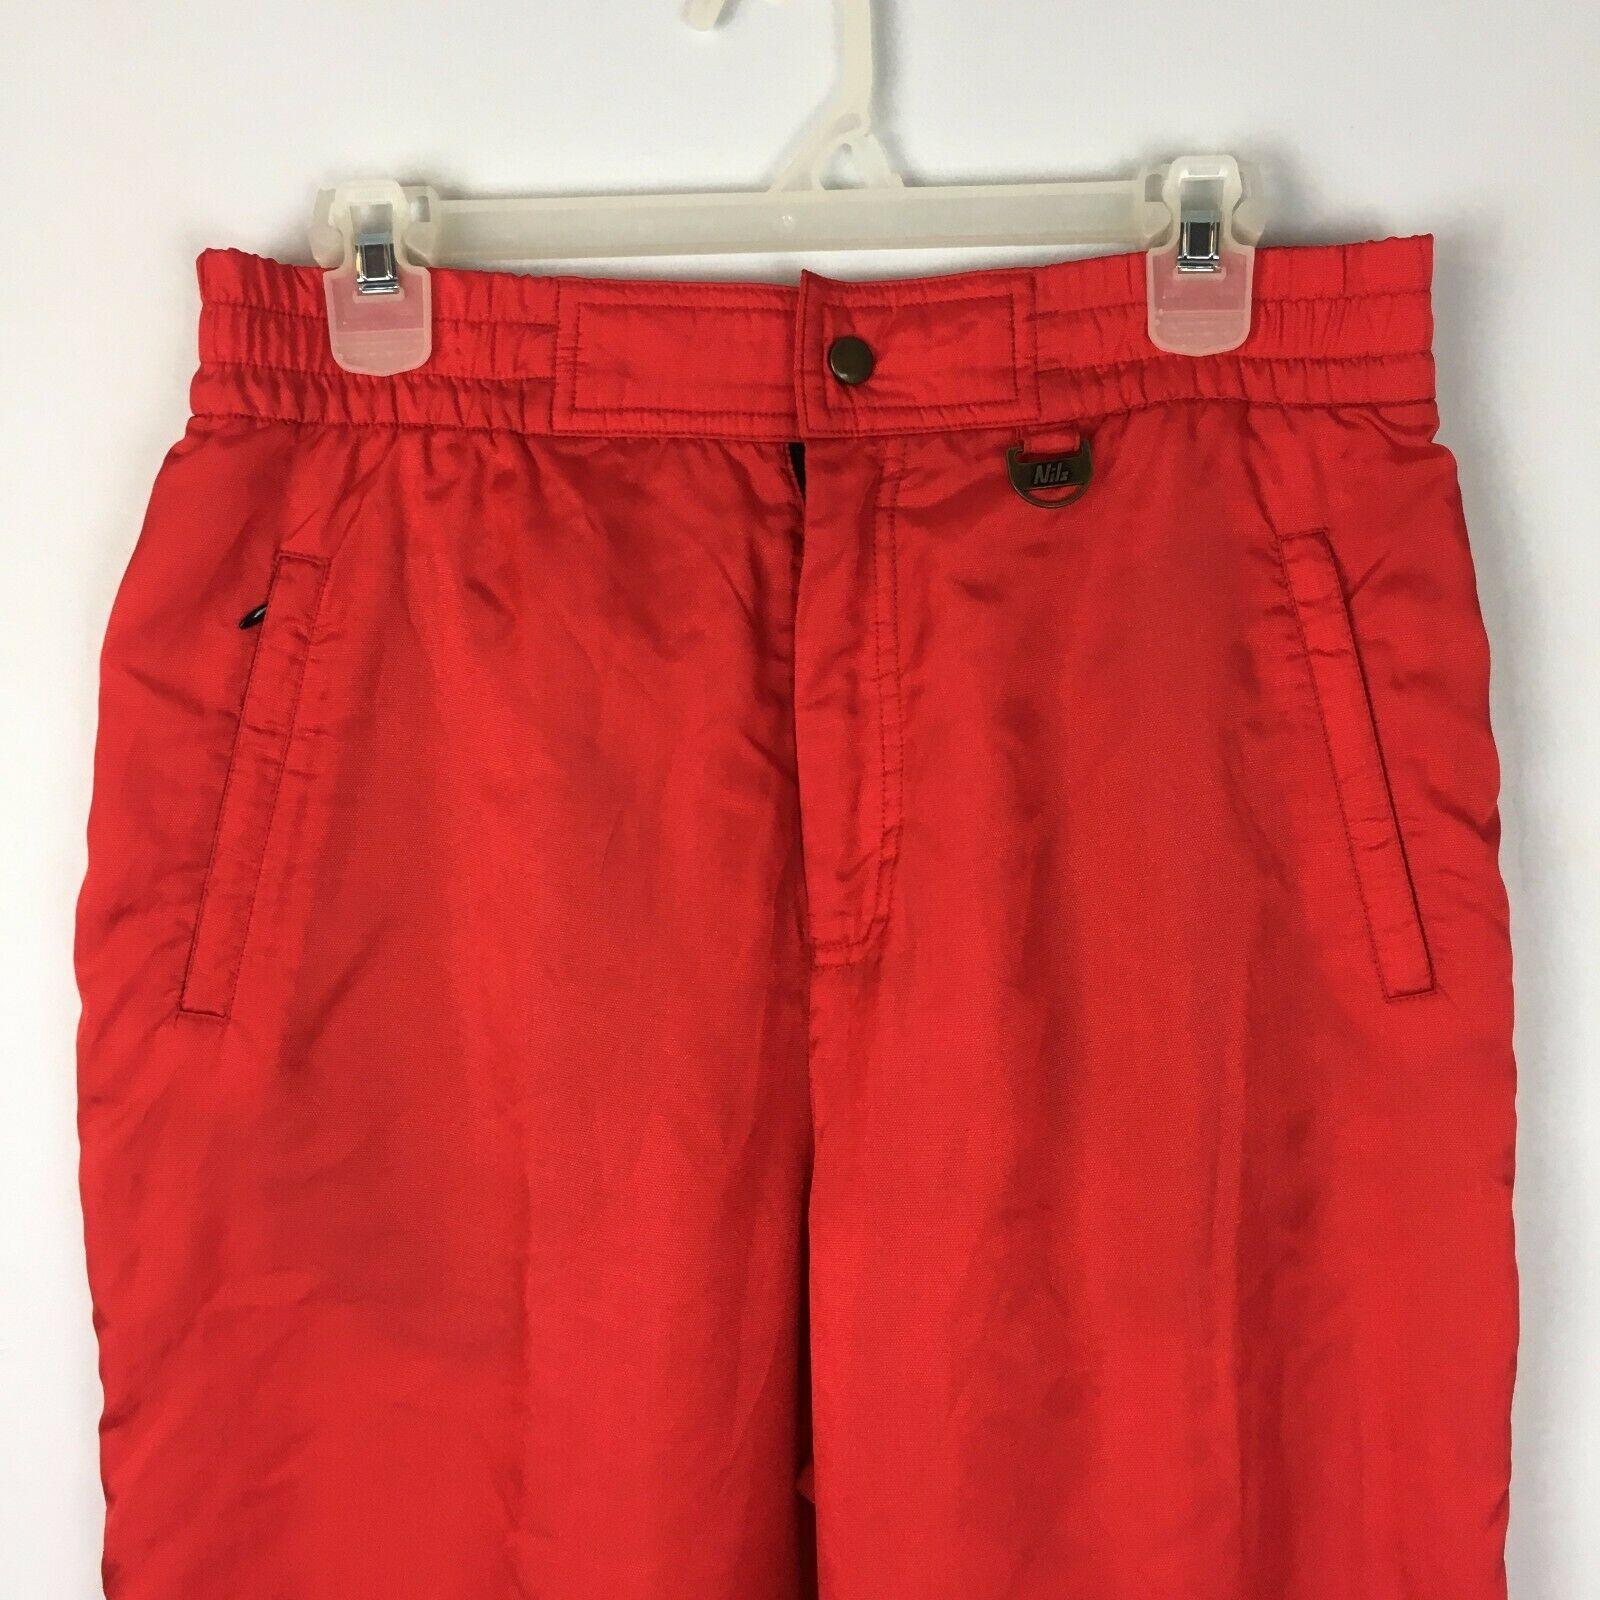 Nils Women's Red Vintage Snowsuit Ski Snow Board Pants Size 16 image 3